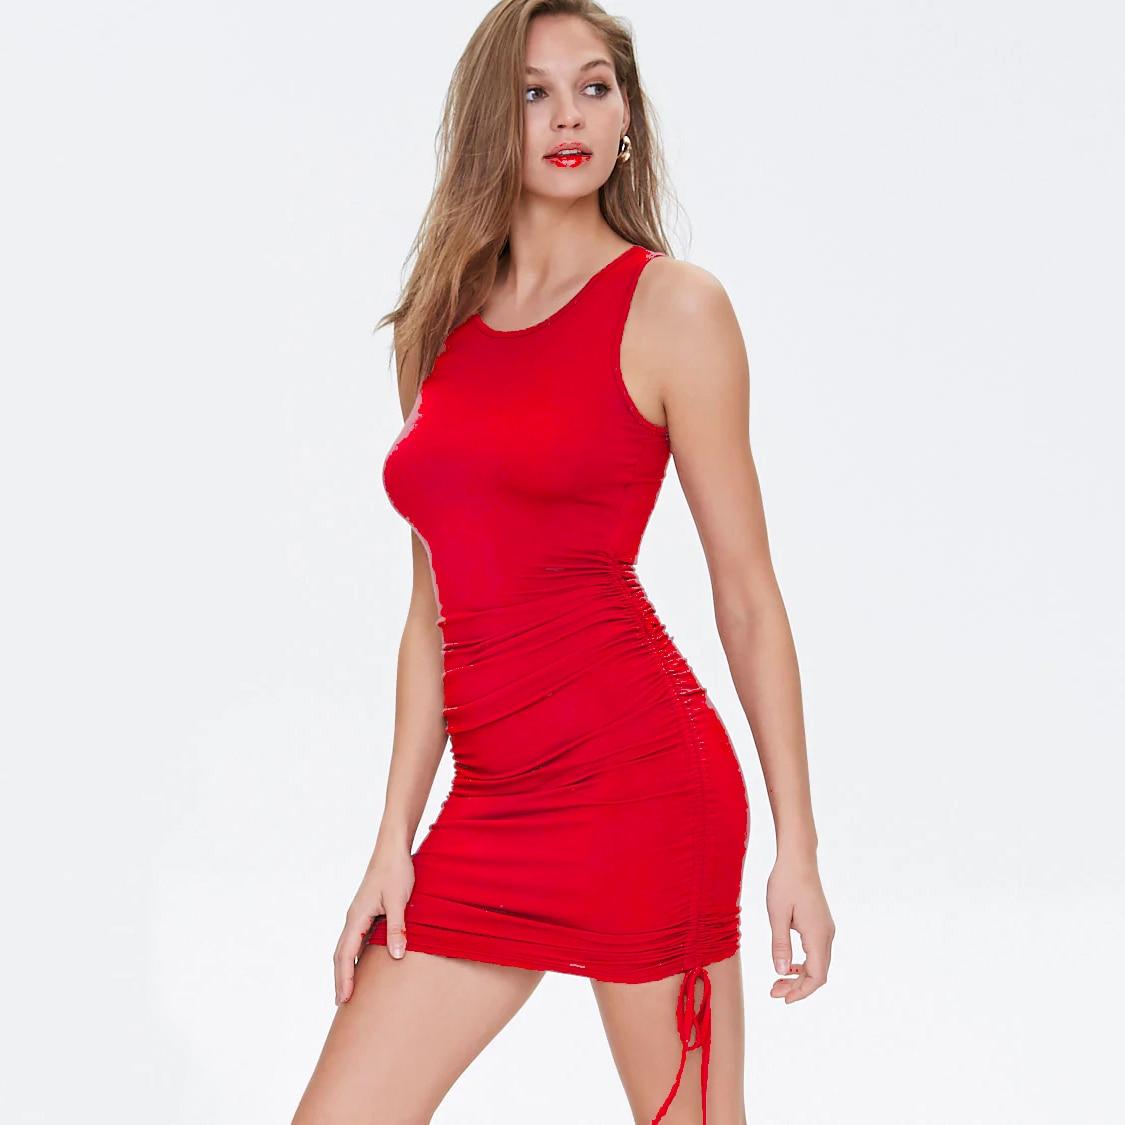 Cotton Ruched Drawstring Sexy Party Dress Women Sleeveless Elastic Mini Dress Vintage Summer Bodycon Club Wear Vestidos 29